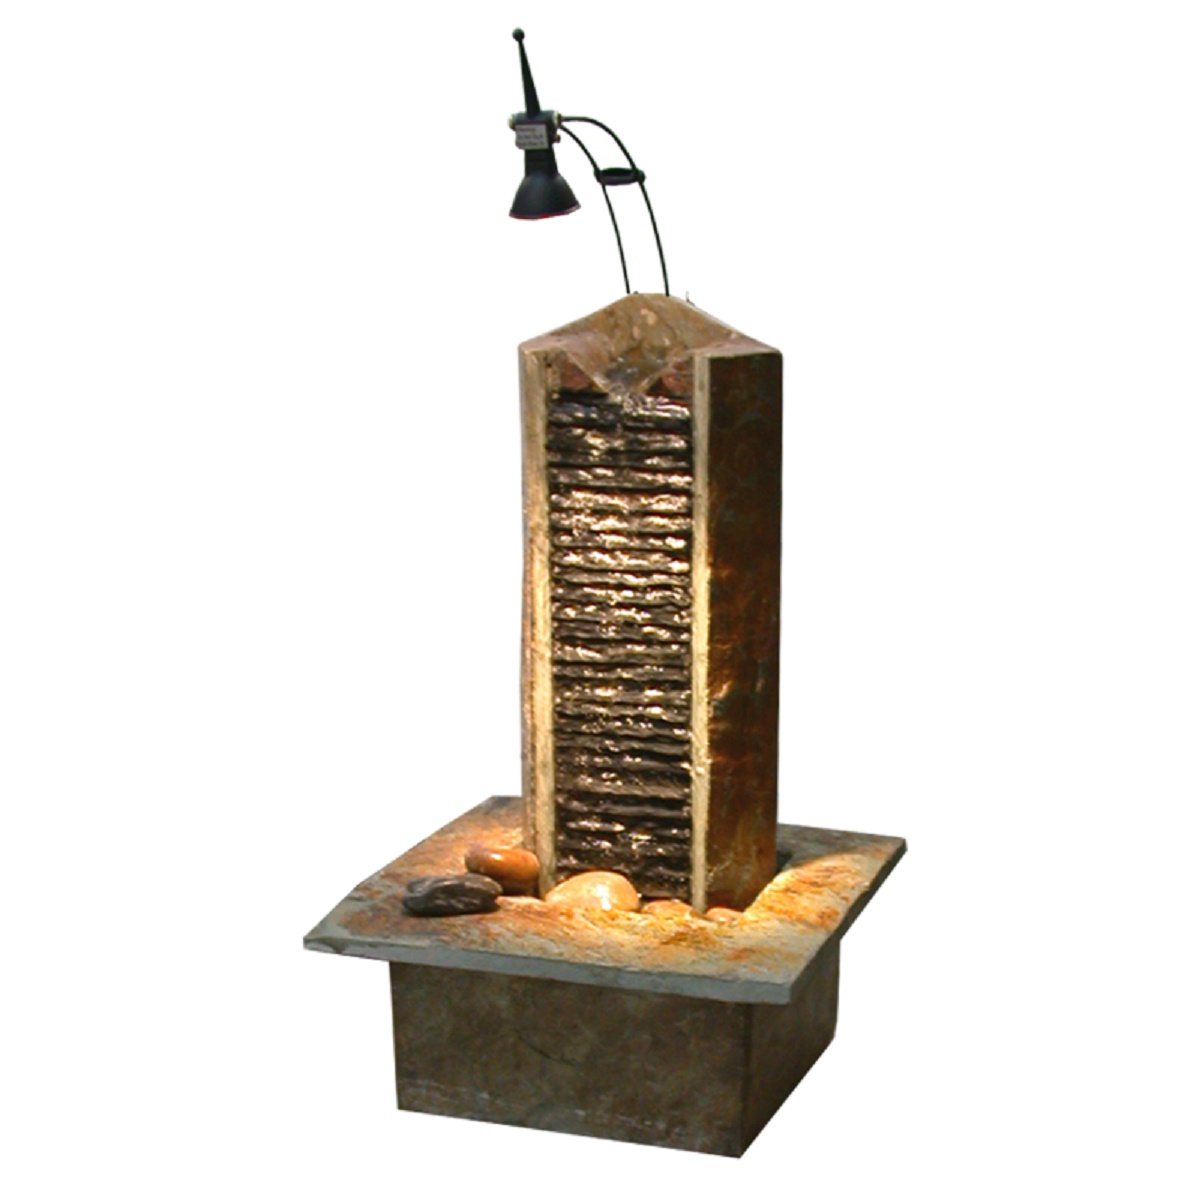 zimmerbrunnen biso 38 feng shui schiefer brunnen wasserwand 7642s. Black Bedroom Furniture Sets. Home Design Ideas